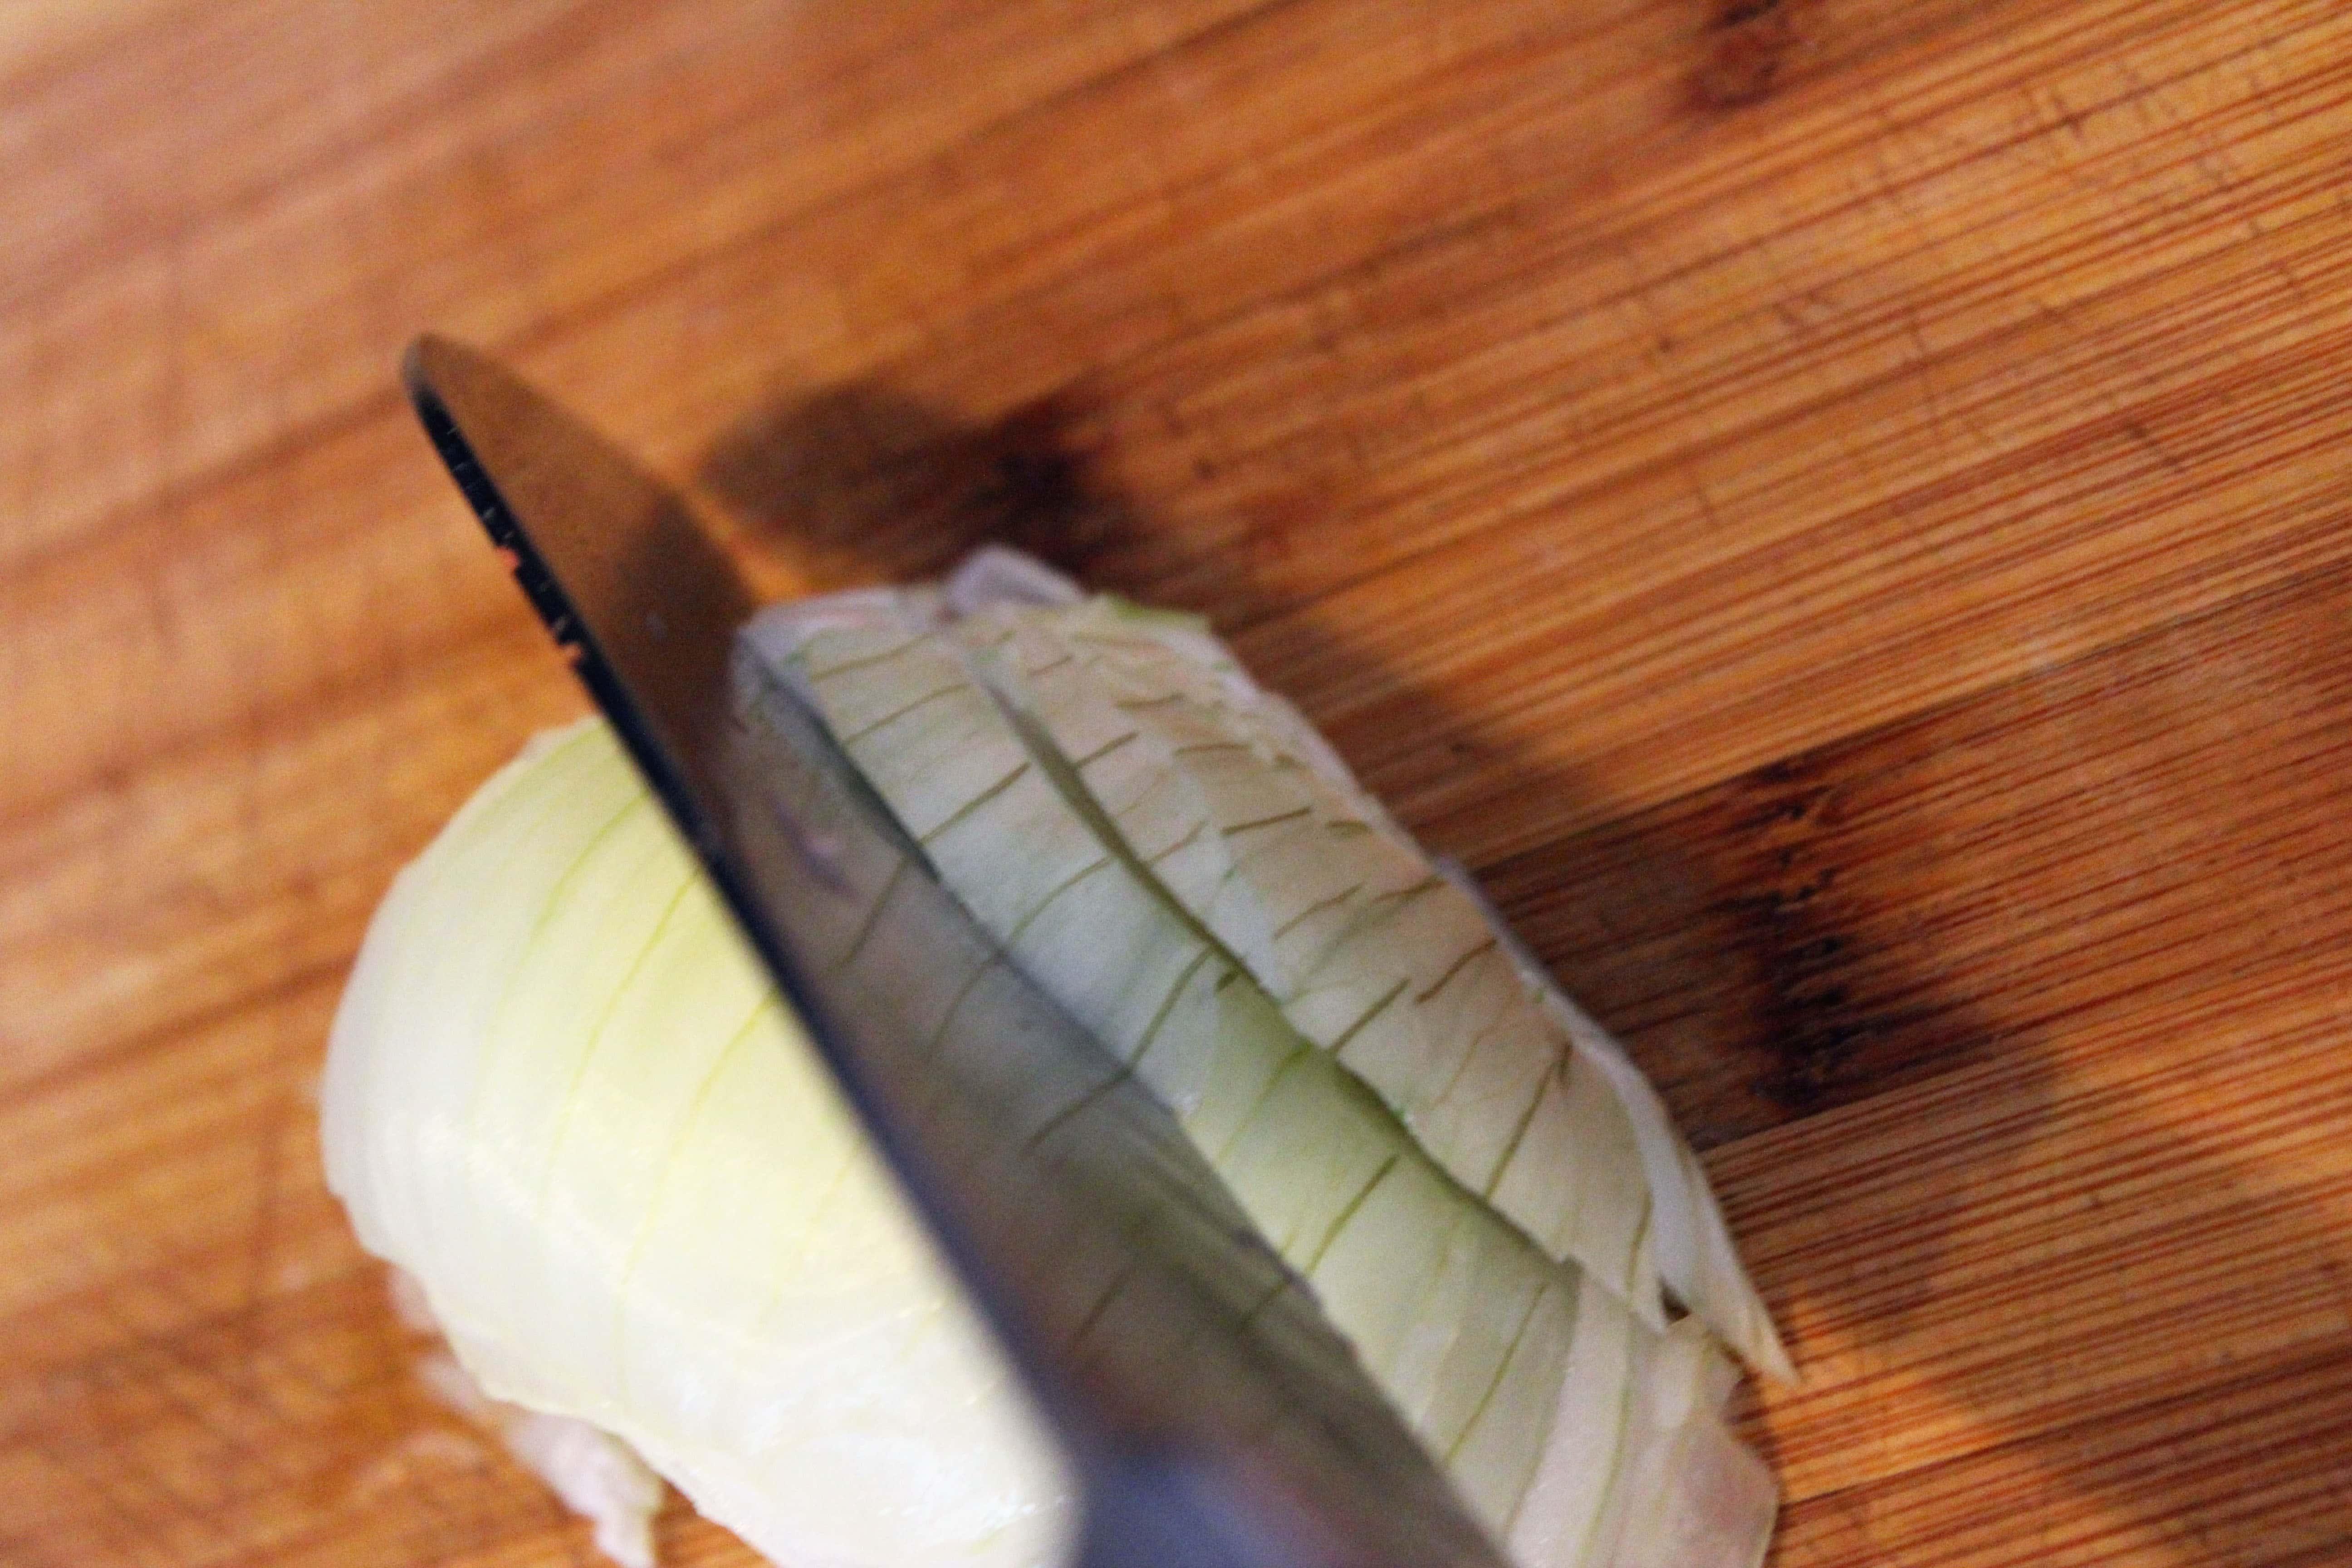 Cut onion planks into strips